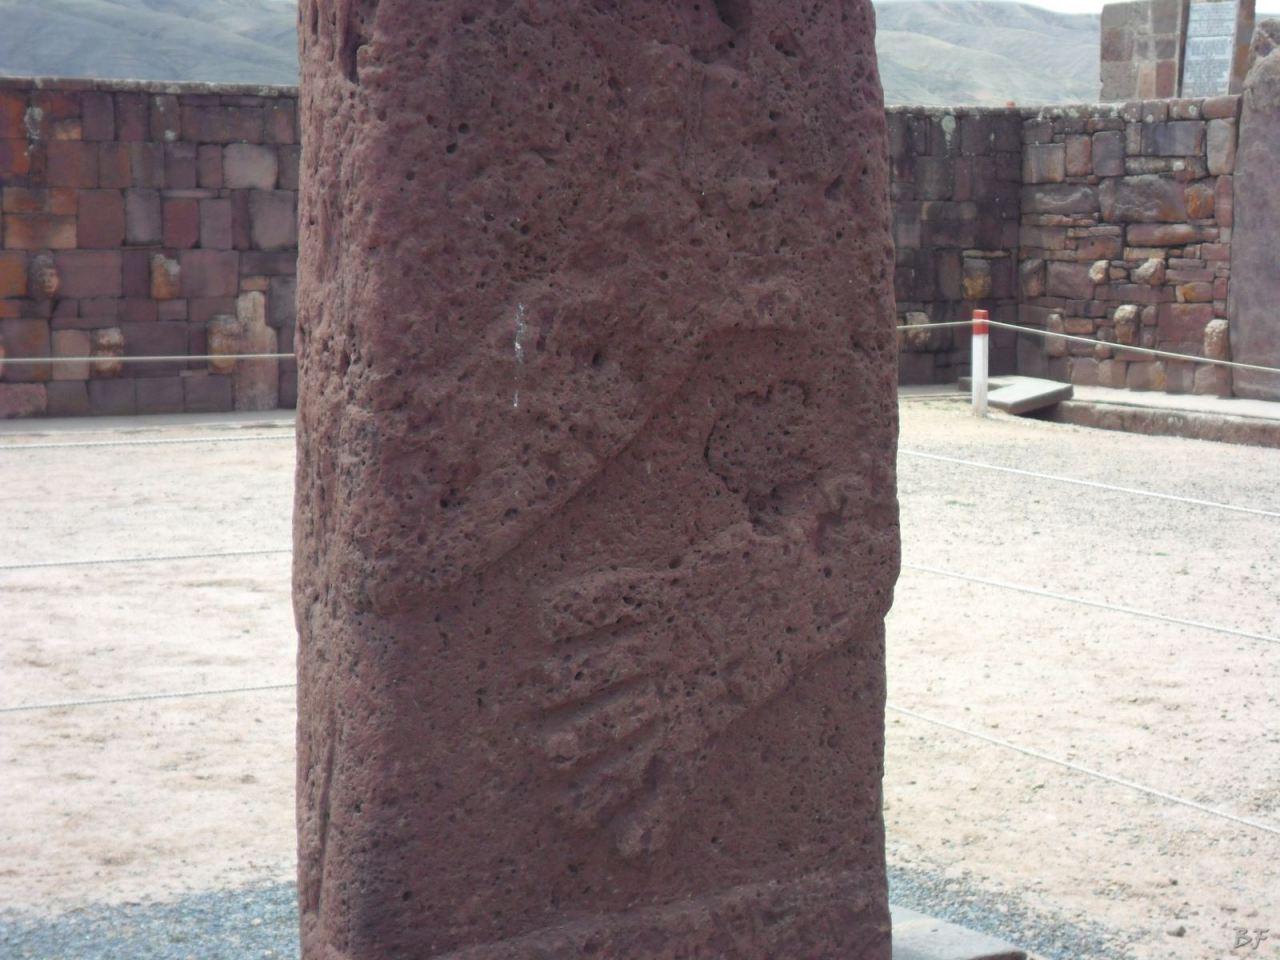 Sito-Megalitico-Piramide-Akapana-Kalasasaya-Menhir-Tiahuanaco-Bolivia-89